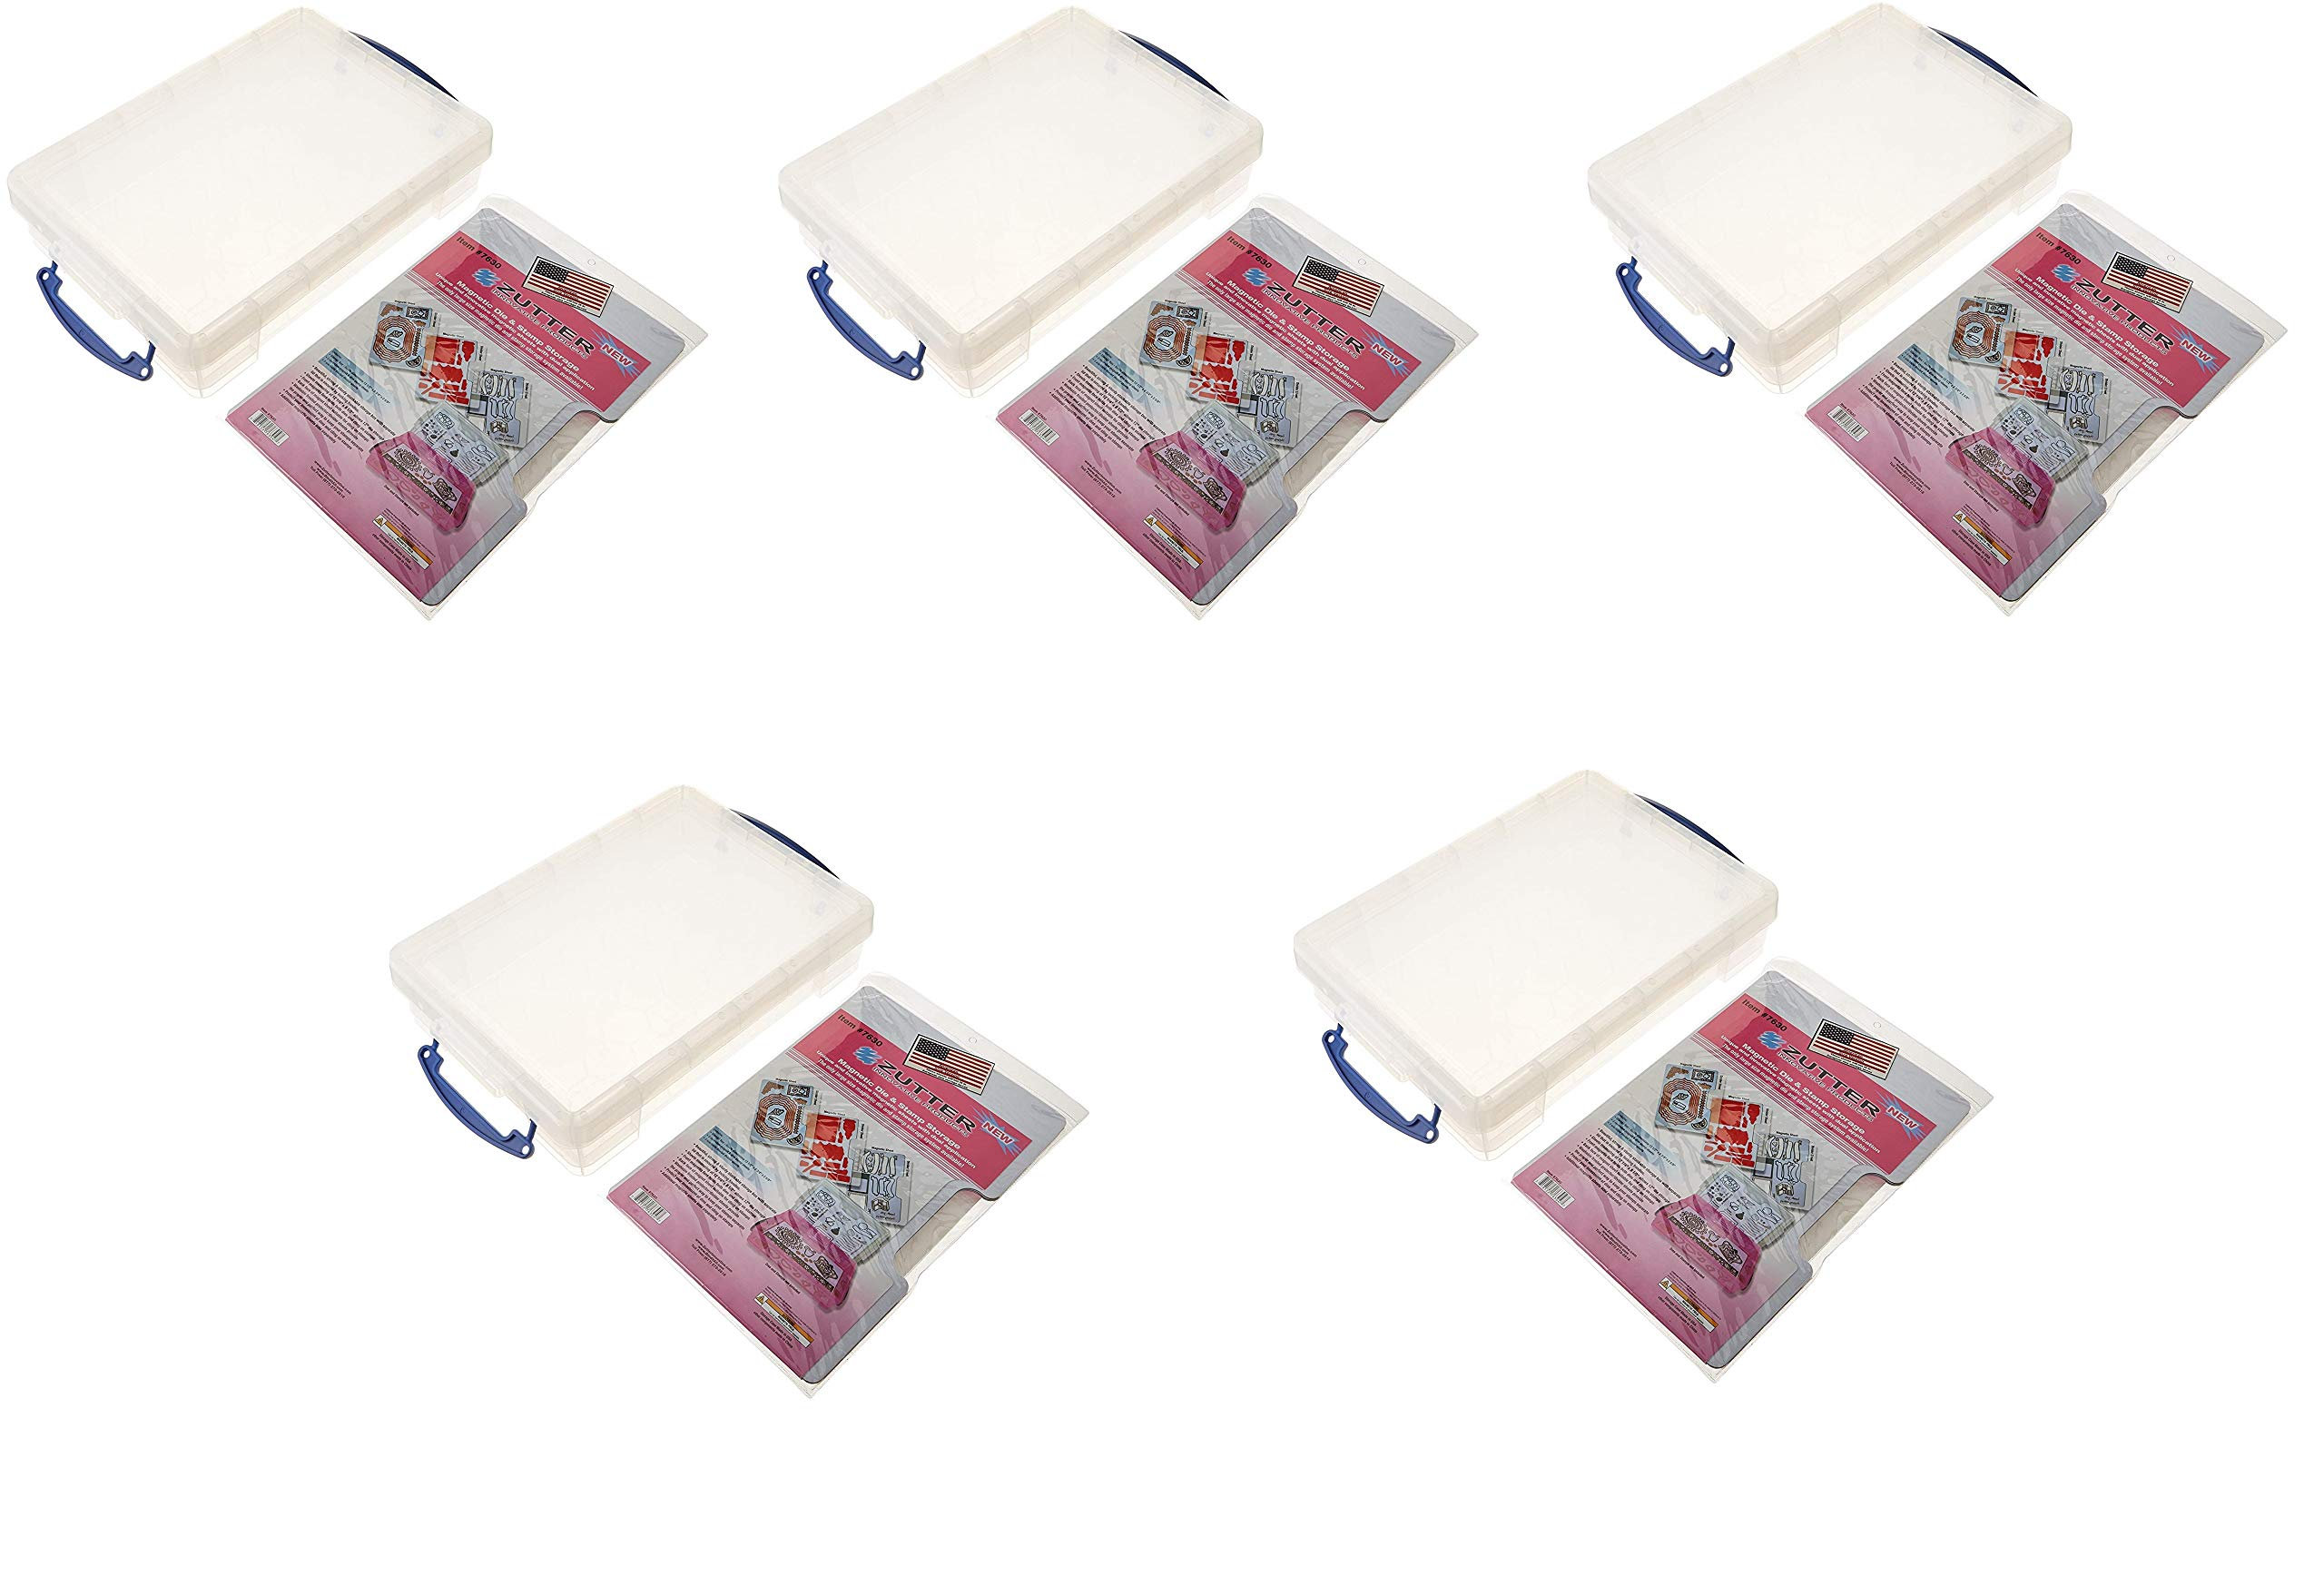 Zutter Magnetic Die & Stamp Storage Box kit (5-Pack)